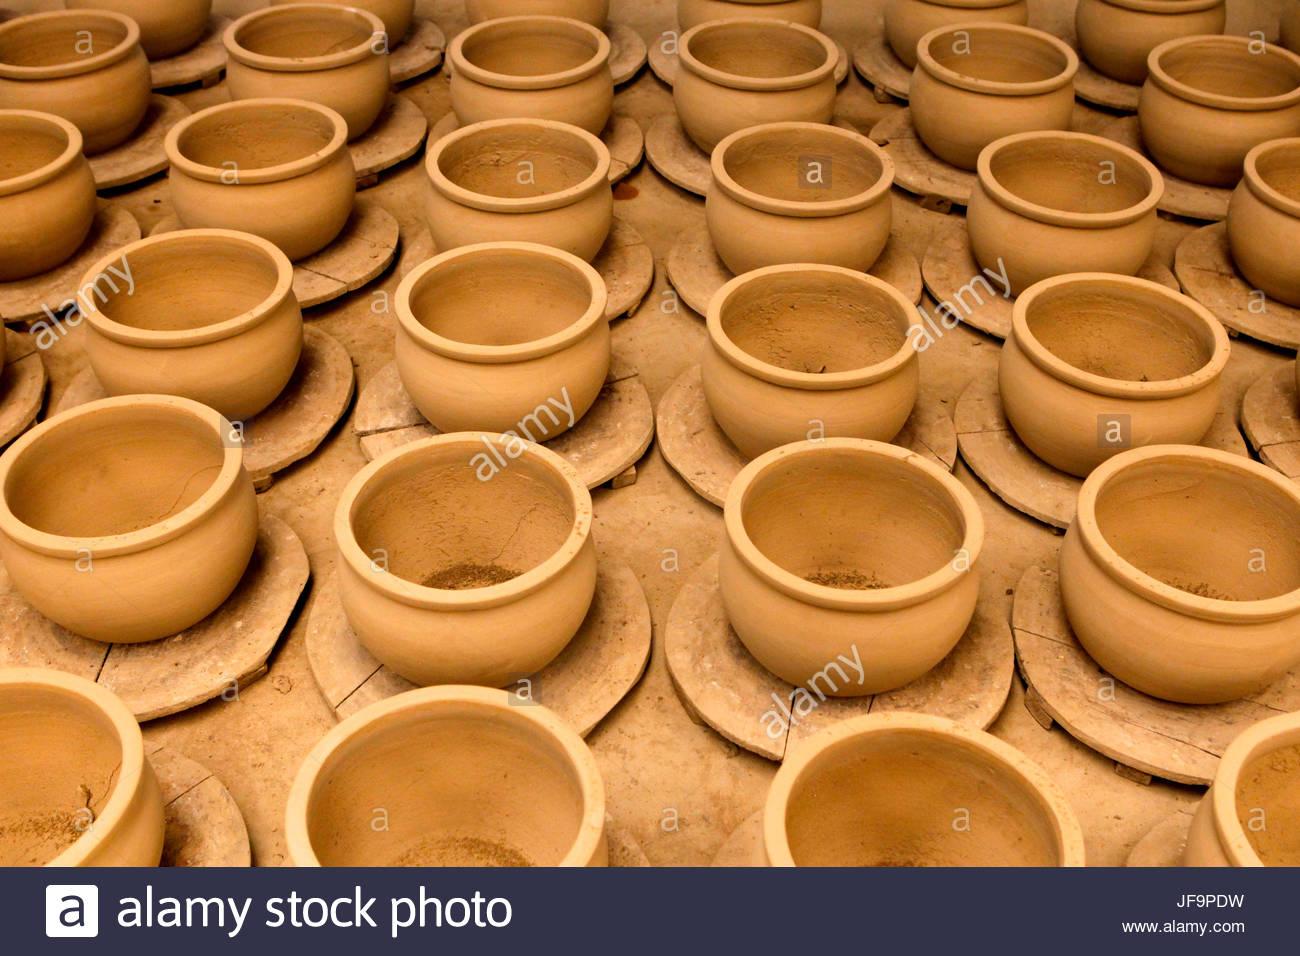 Trocknende Keramik entlang dem Mekong Flussdelta später verkauft werden. Stockbild